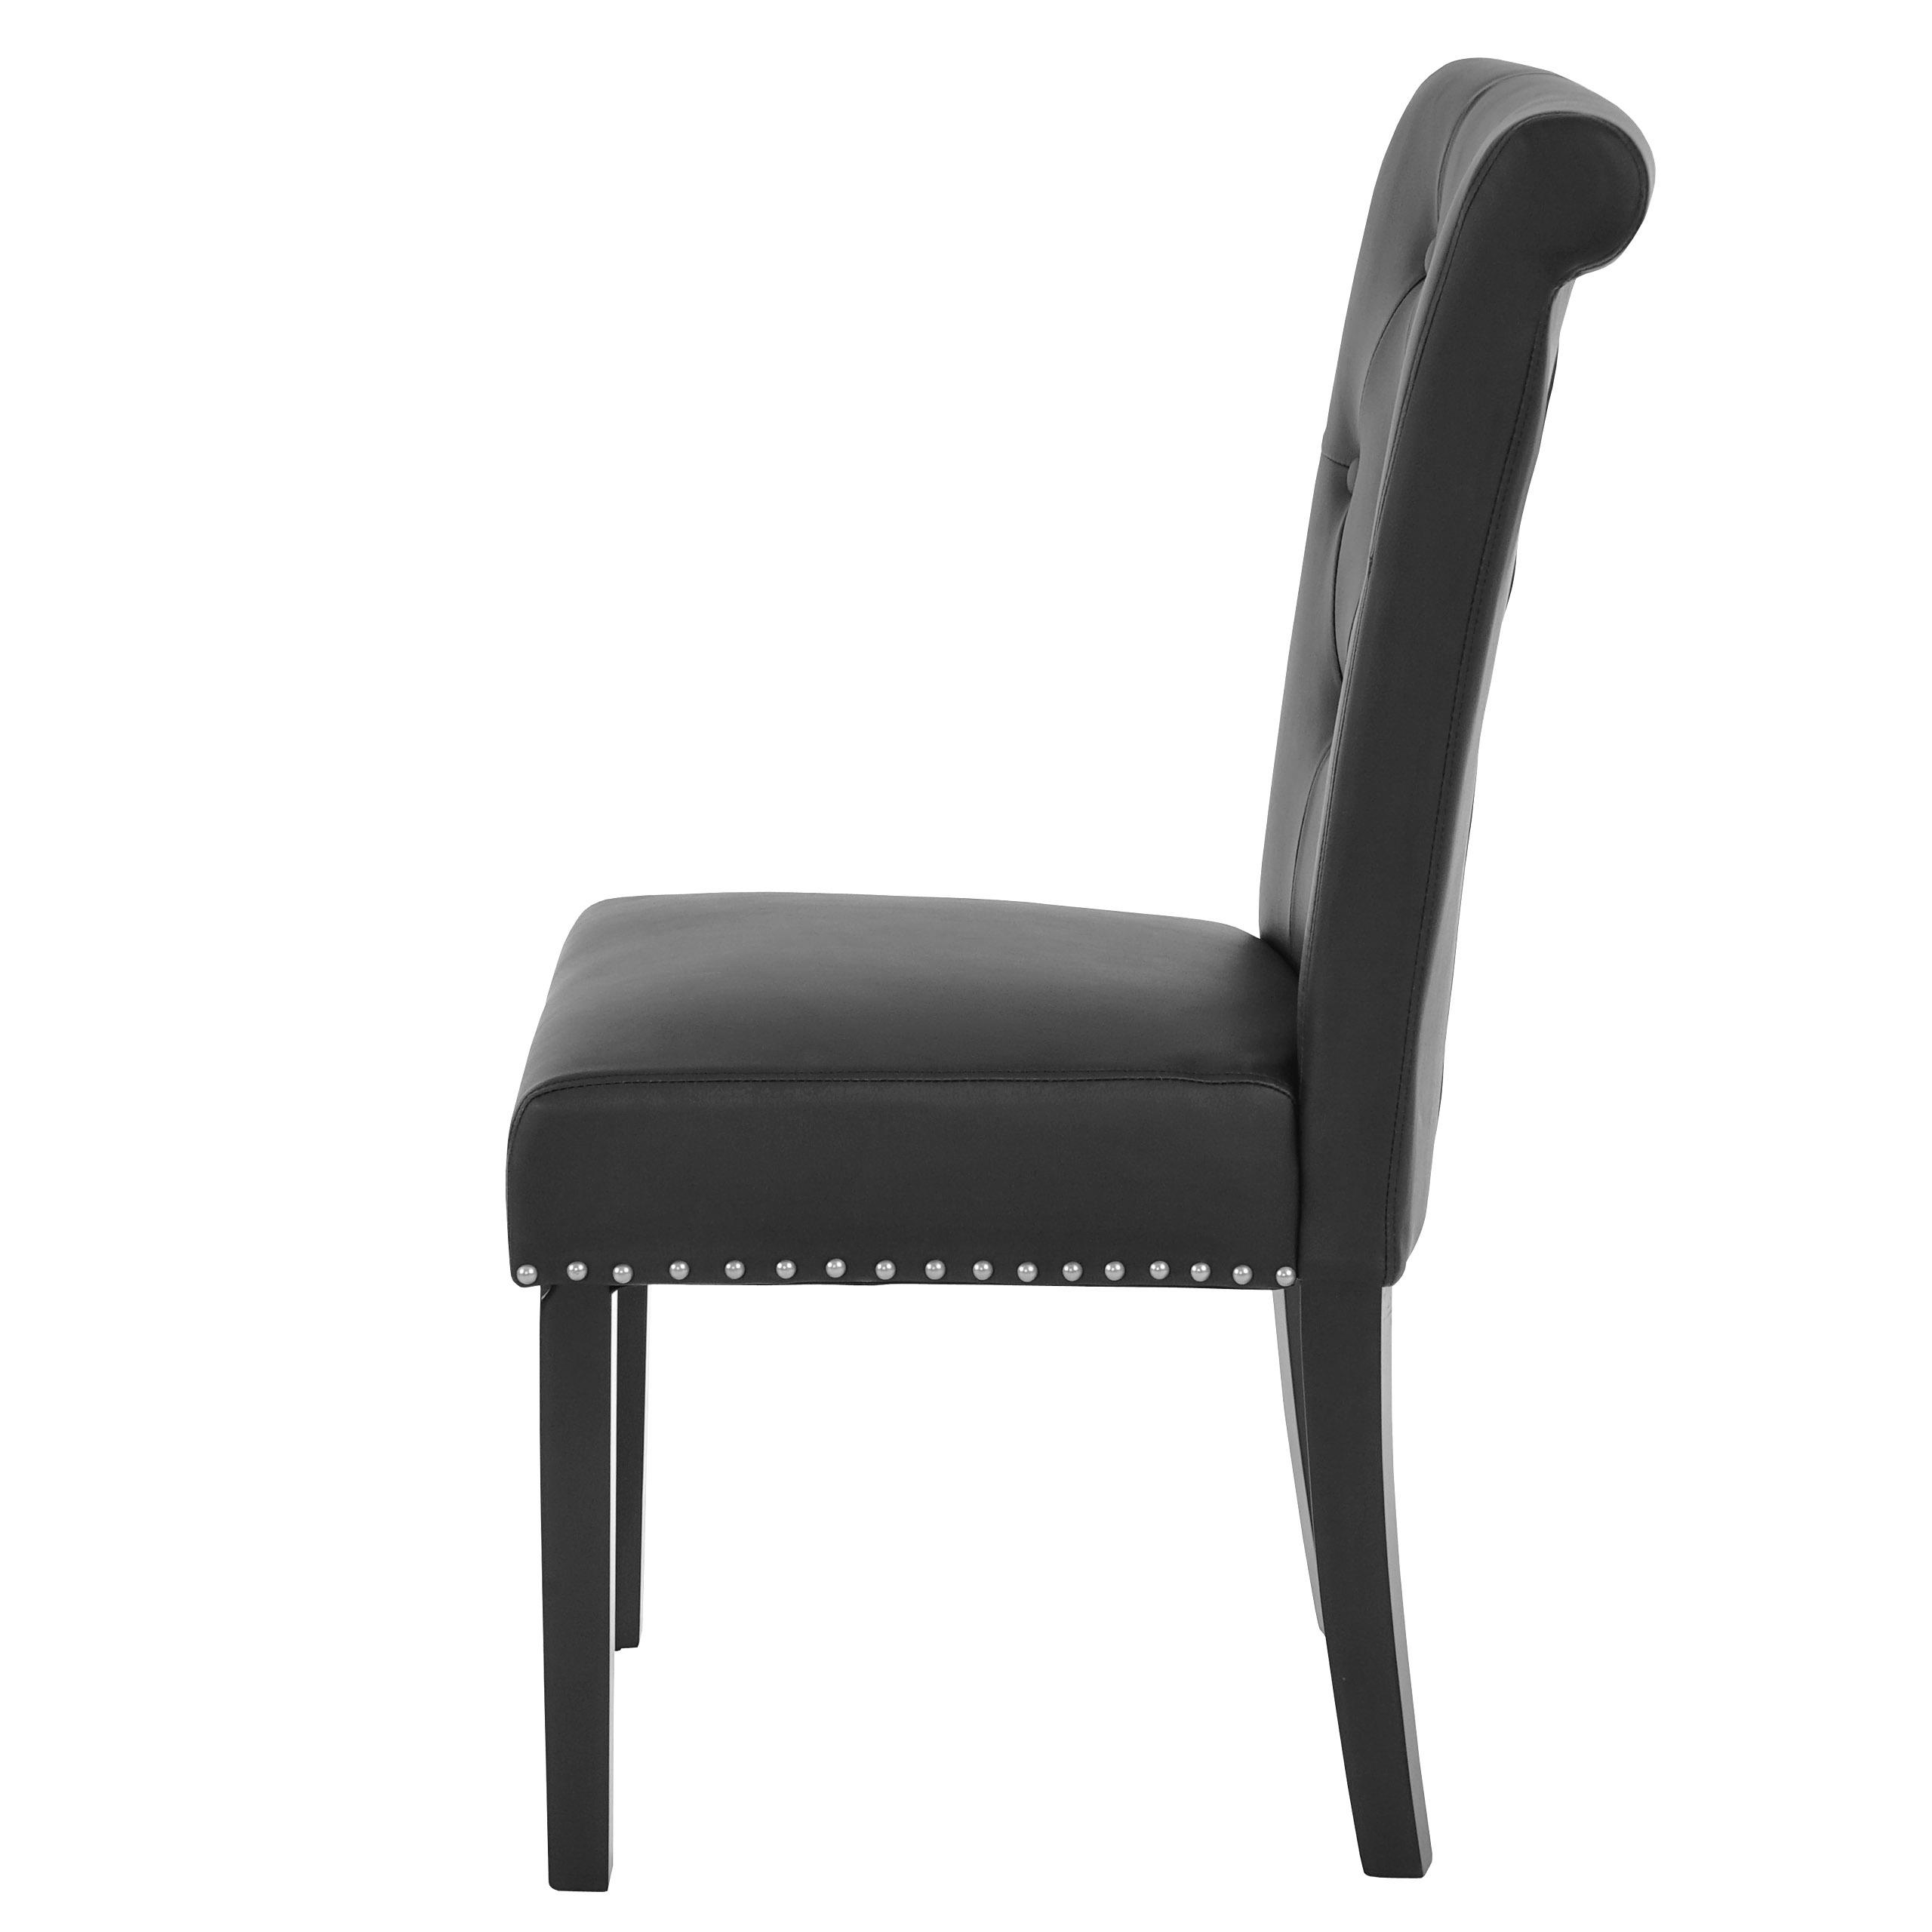 2x esszimmerstuhl chesterfield ii stuhl lehnstuhl nieten kunstleder schwarz dunkle beine. Black Bedroom Furniture Sets. Home Design Ideas